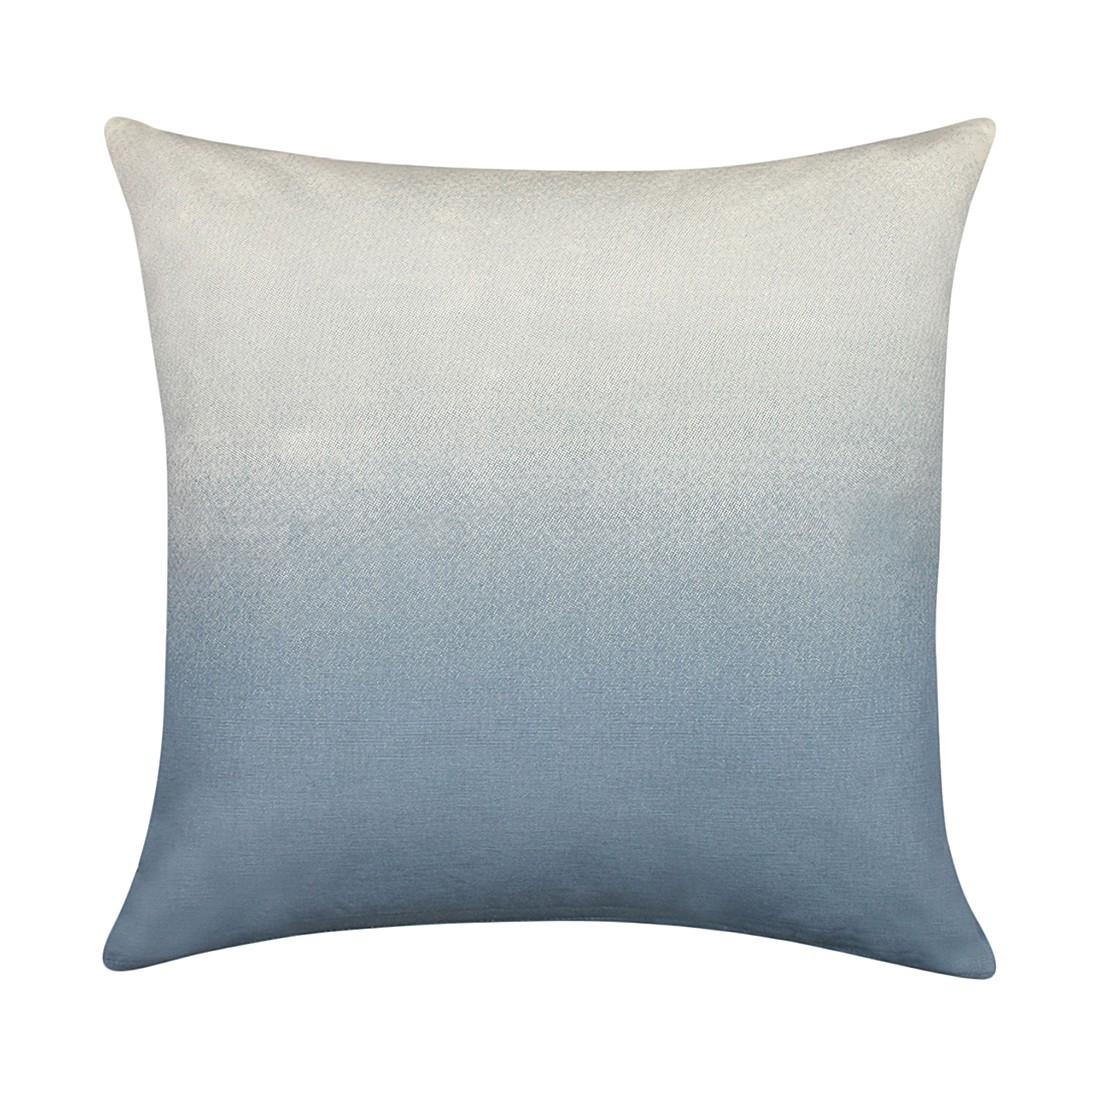 kissen araqua 50 x 50 cm titan baumwolle kissenh lle mit f llung dutch decor g nstig kaufen. Black Bedroom Furniture Sets. Home Design Ideas